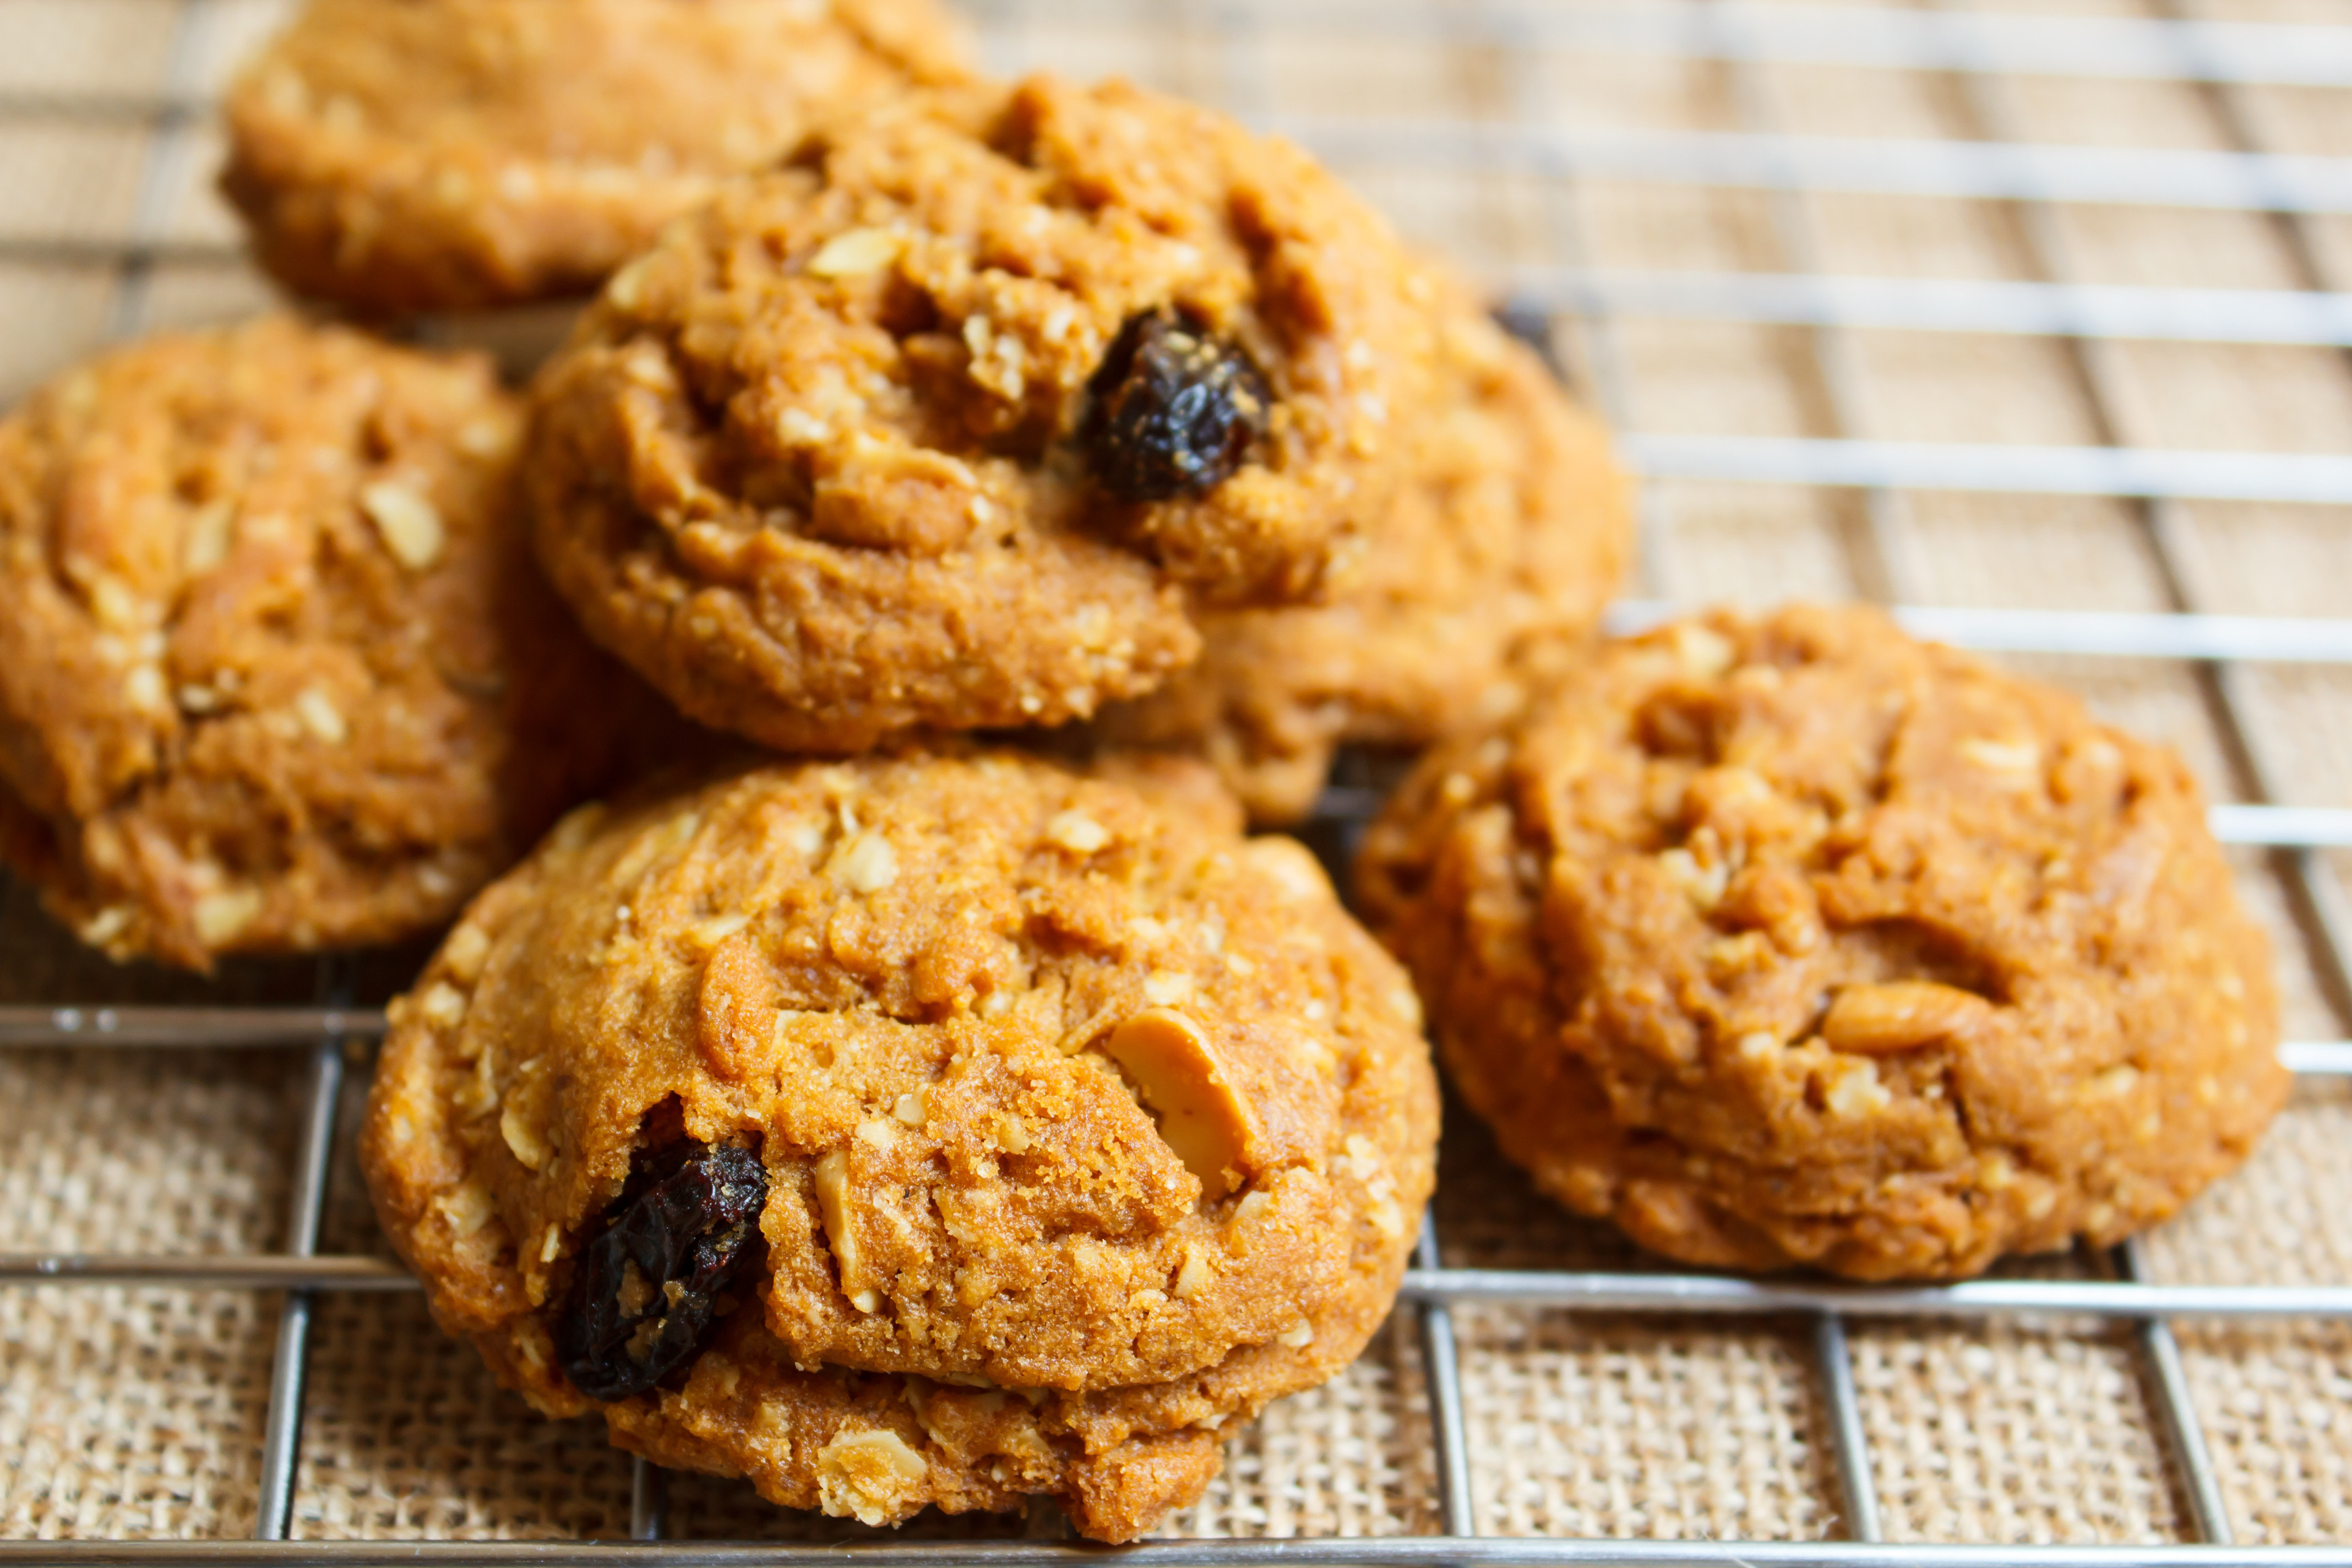 Sugar Free Oatmeal Raisin Cookies For Diabetics  Oatmeal Cookie Recipe for Diabetics